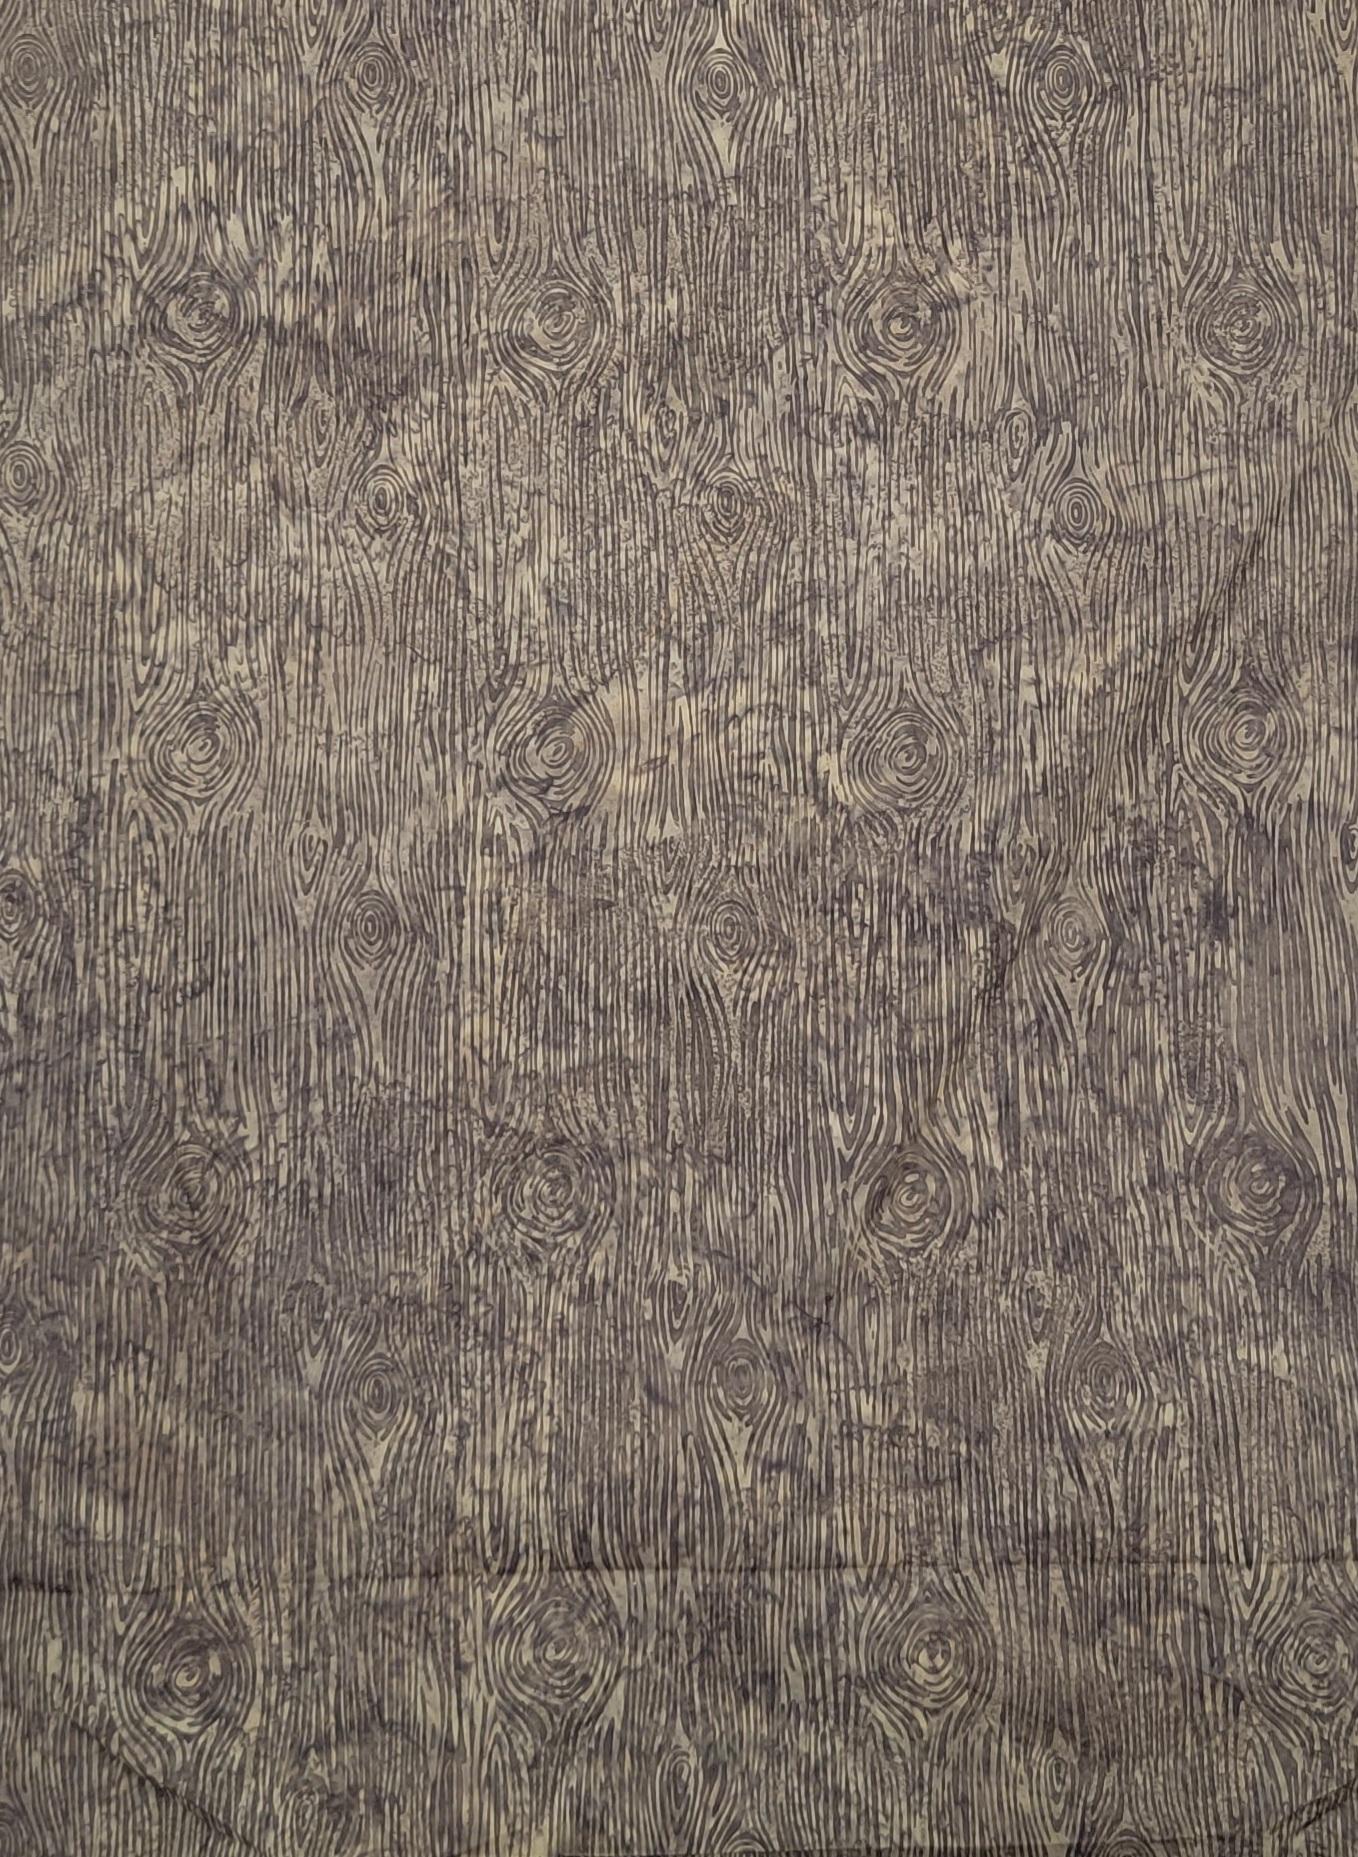 Hoffman R2235-49 Khaki Wood Grain Batik